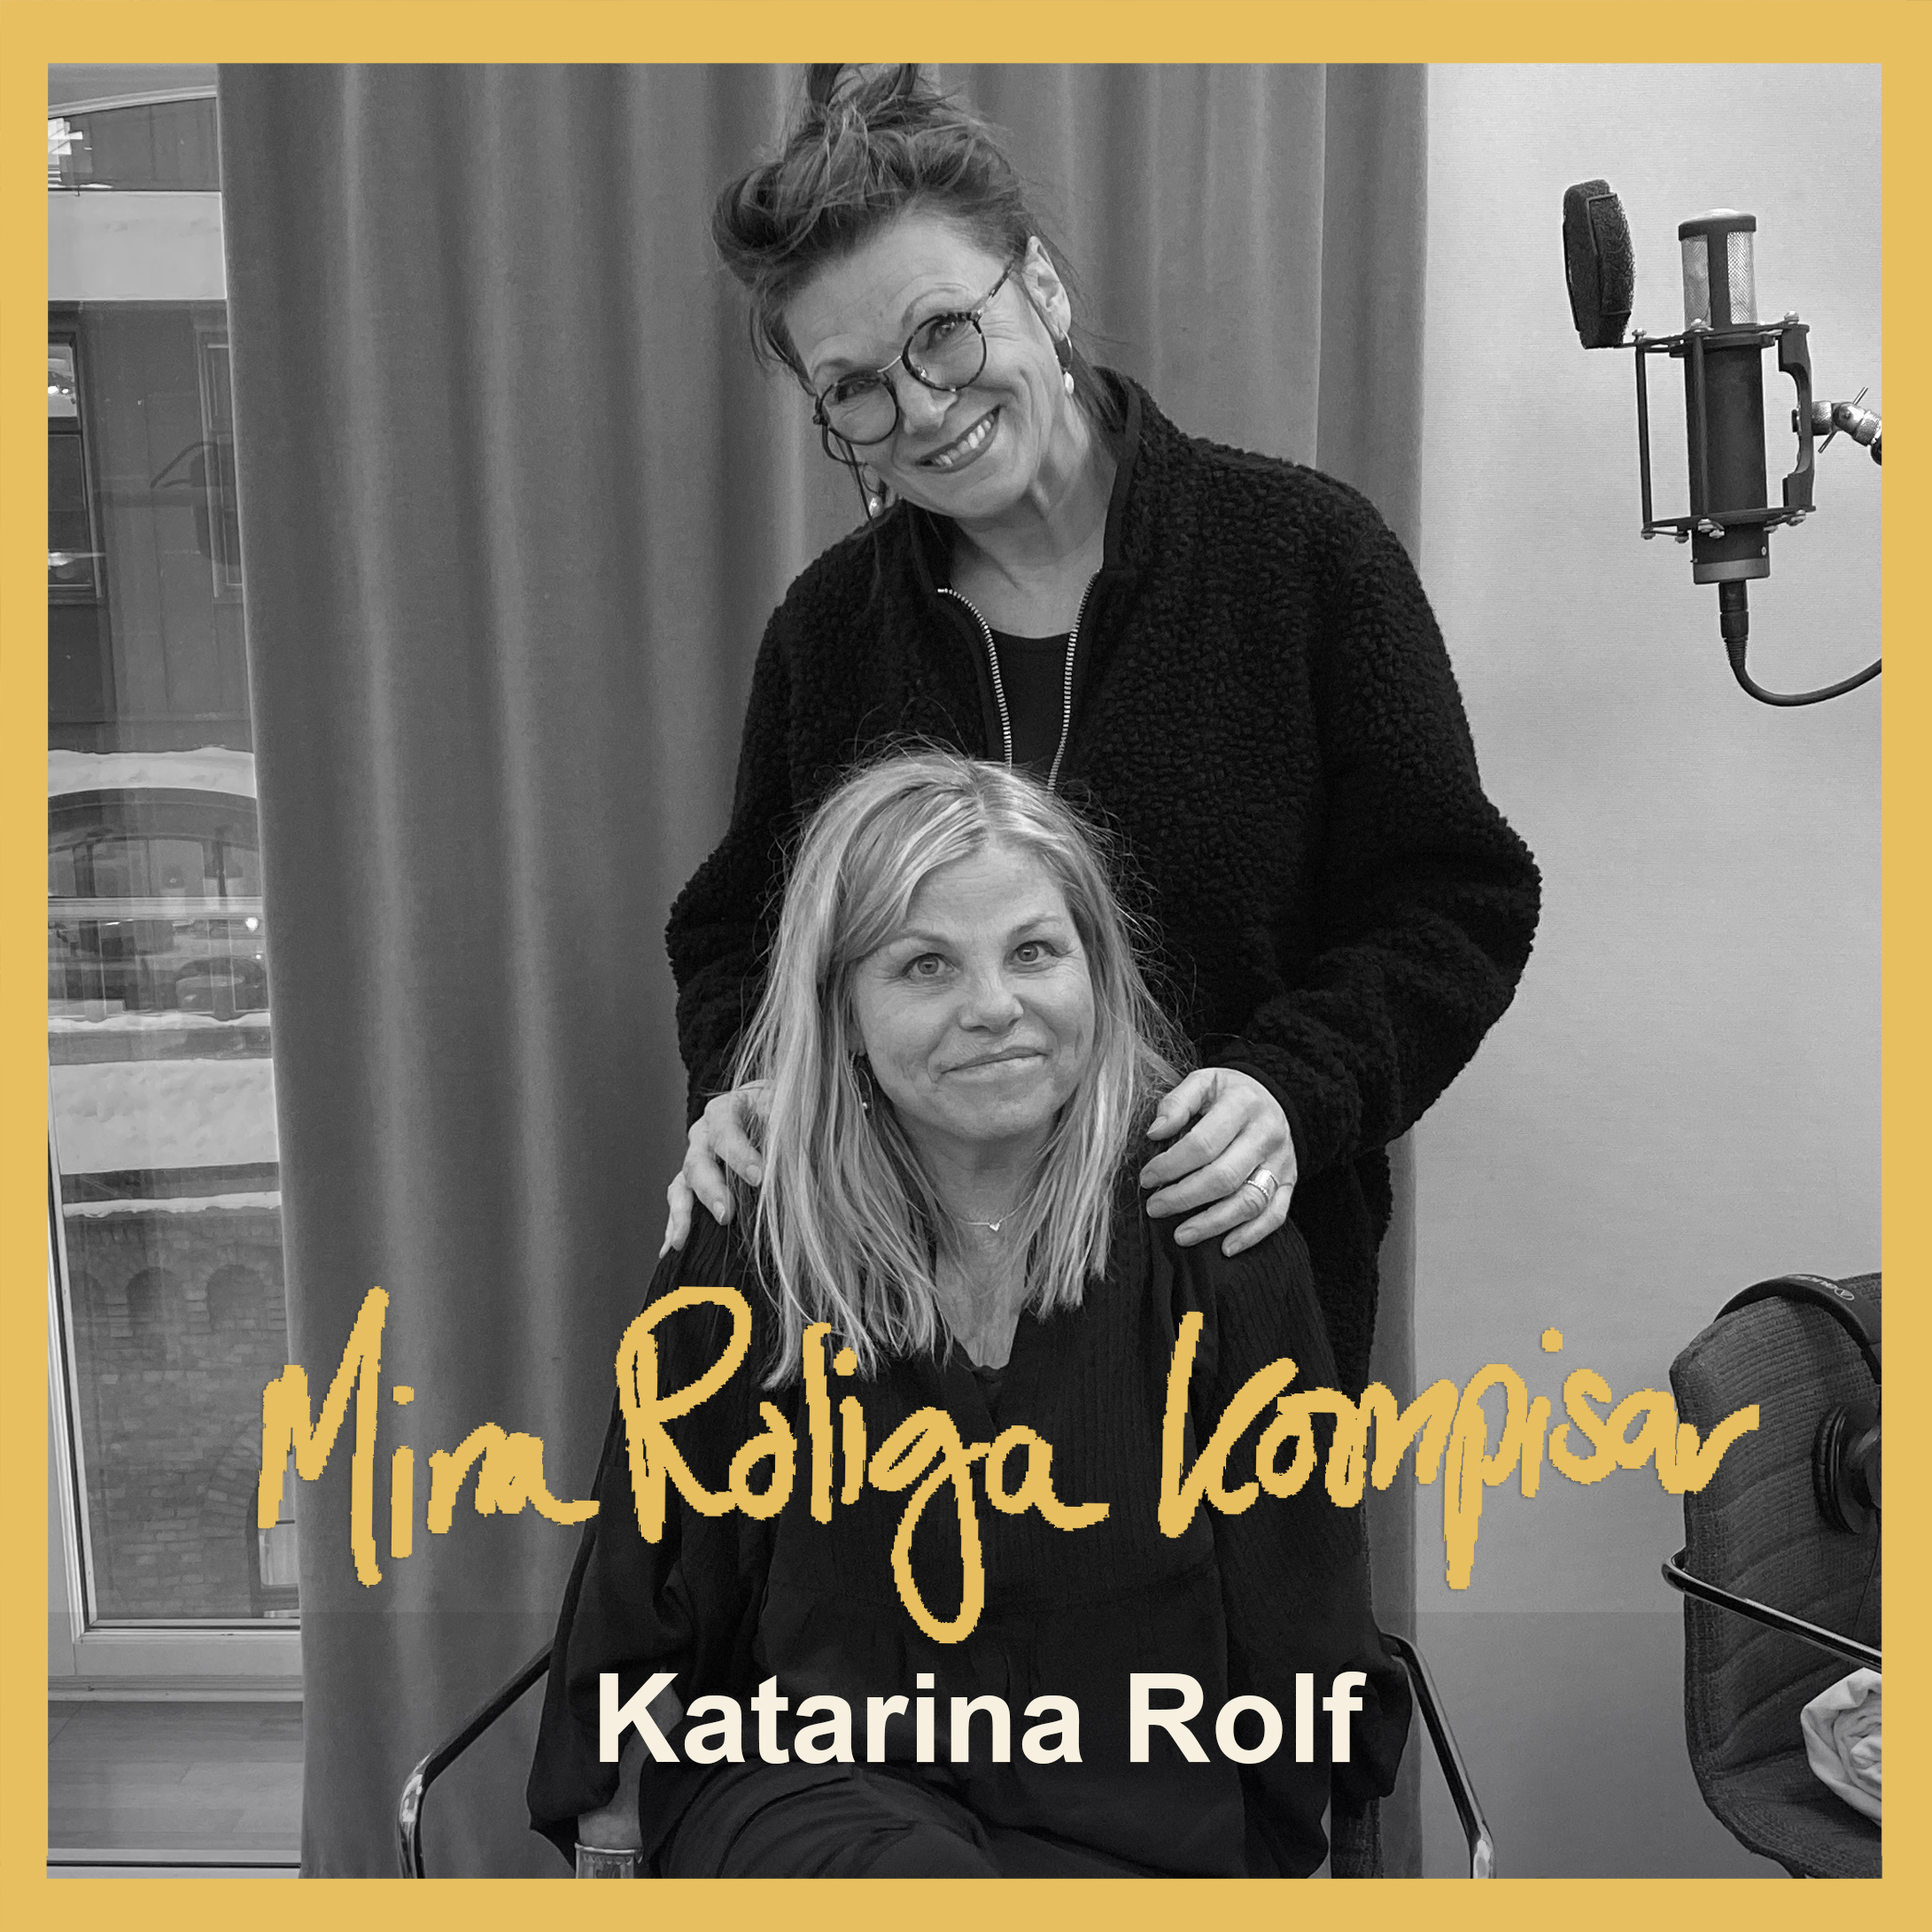 15. Katarina Rolf